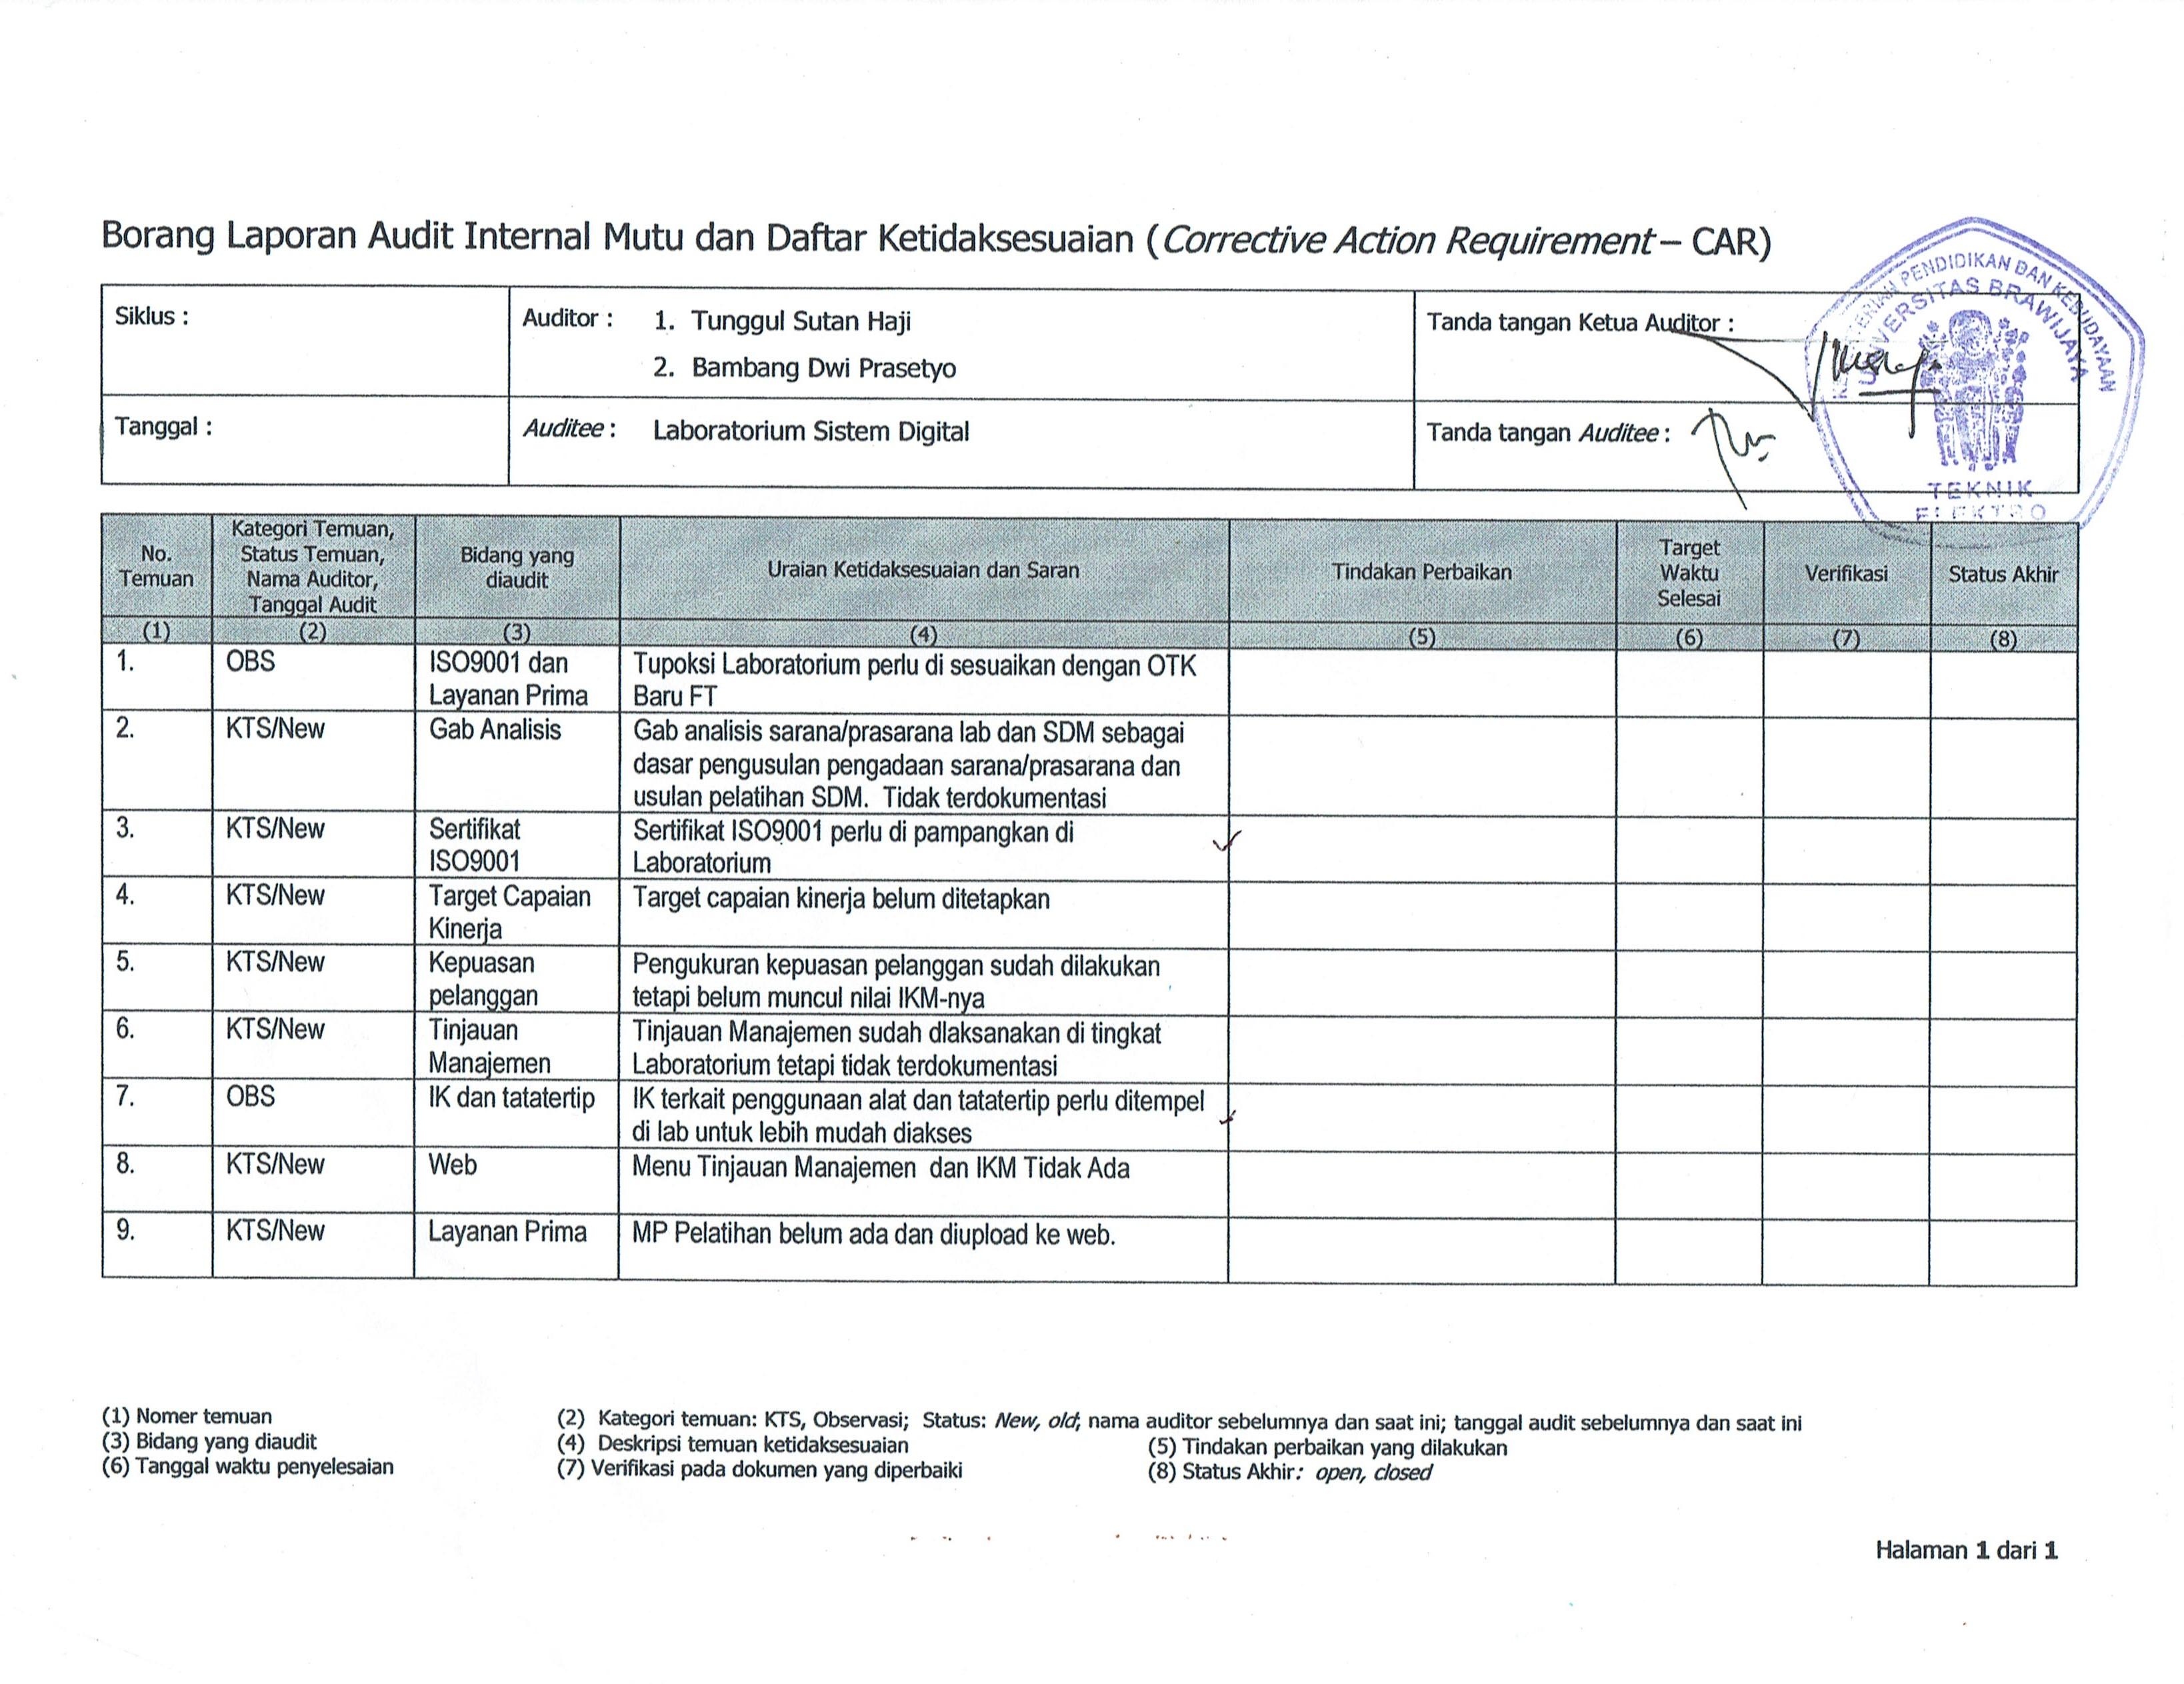 Hasil Audit Internal Eksternal Laboratorium Sistem Digital